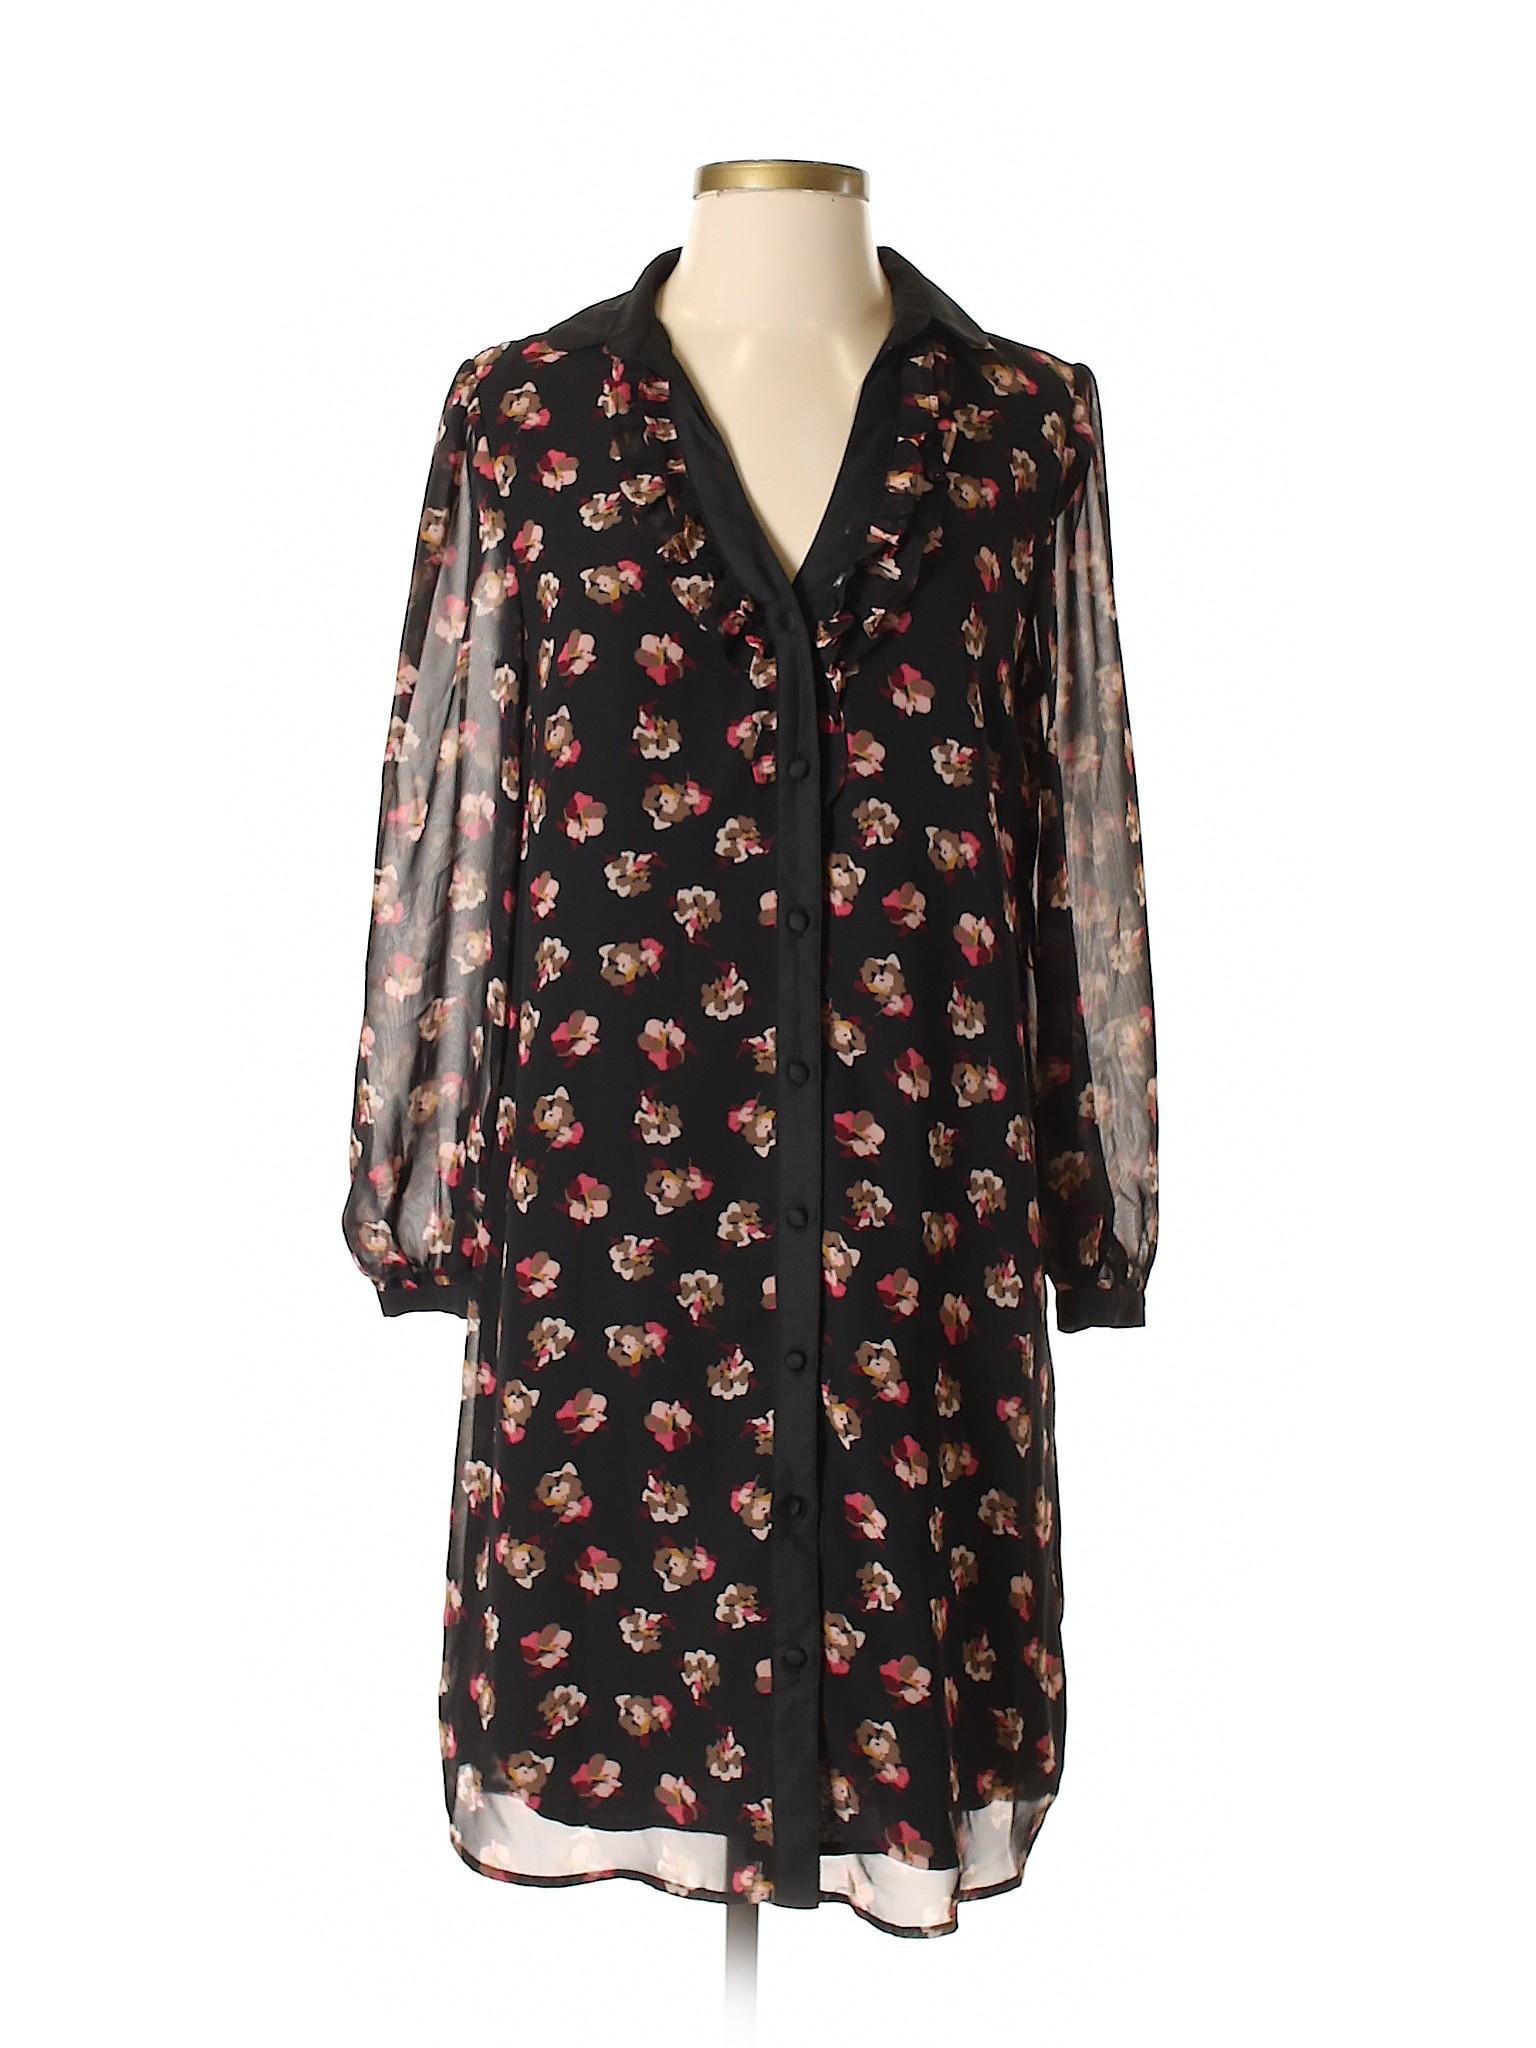 Casual winter Dress Boutique Elle winter Dress Boutique Casual Boutique winter Elle Xnn7Ar